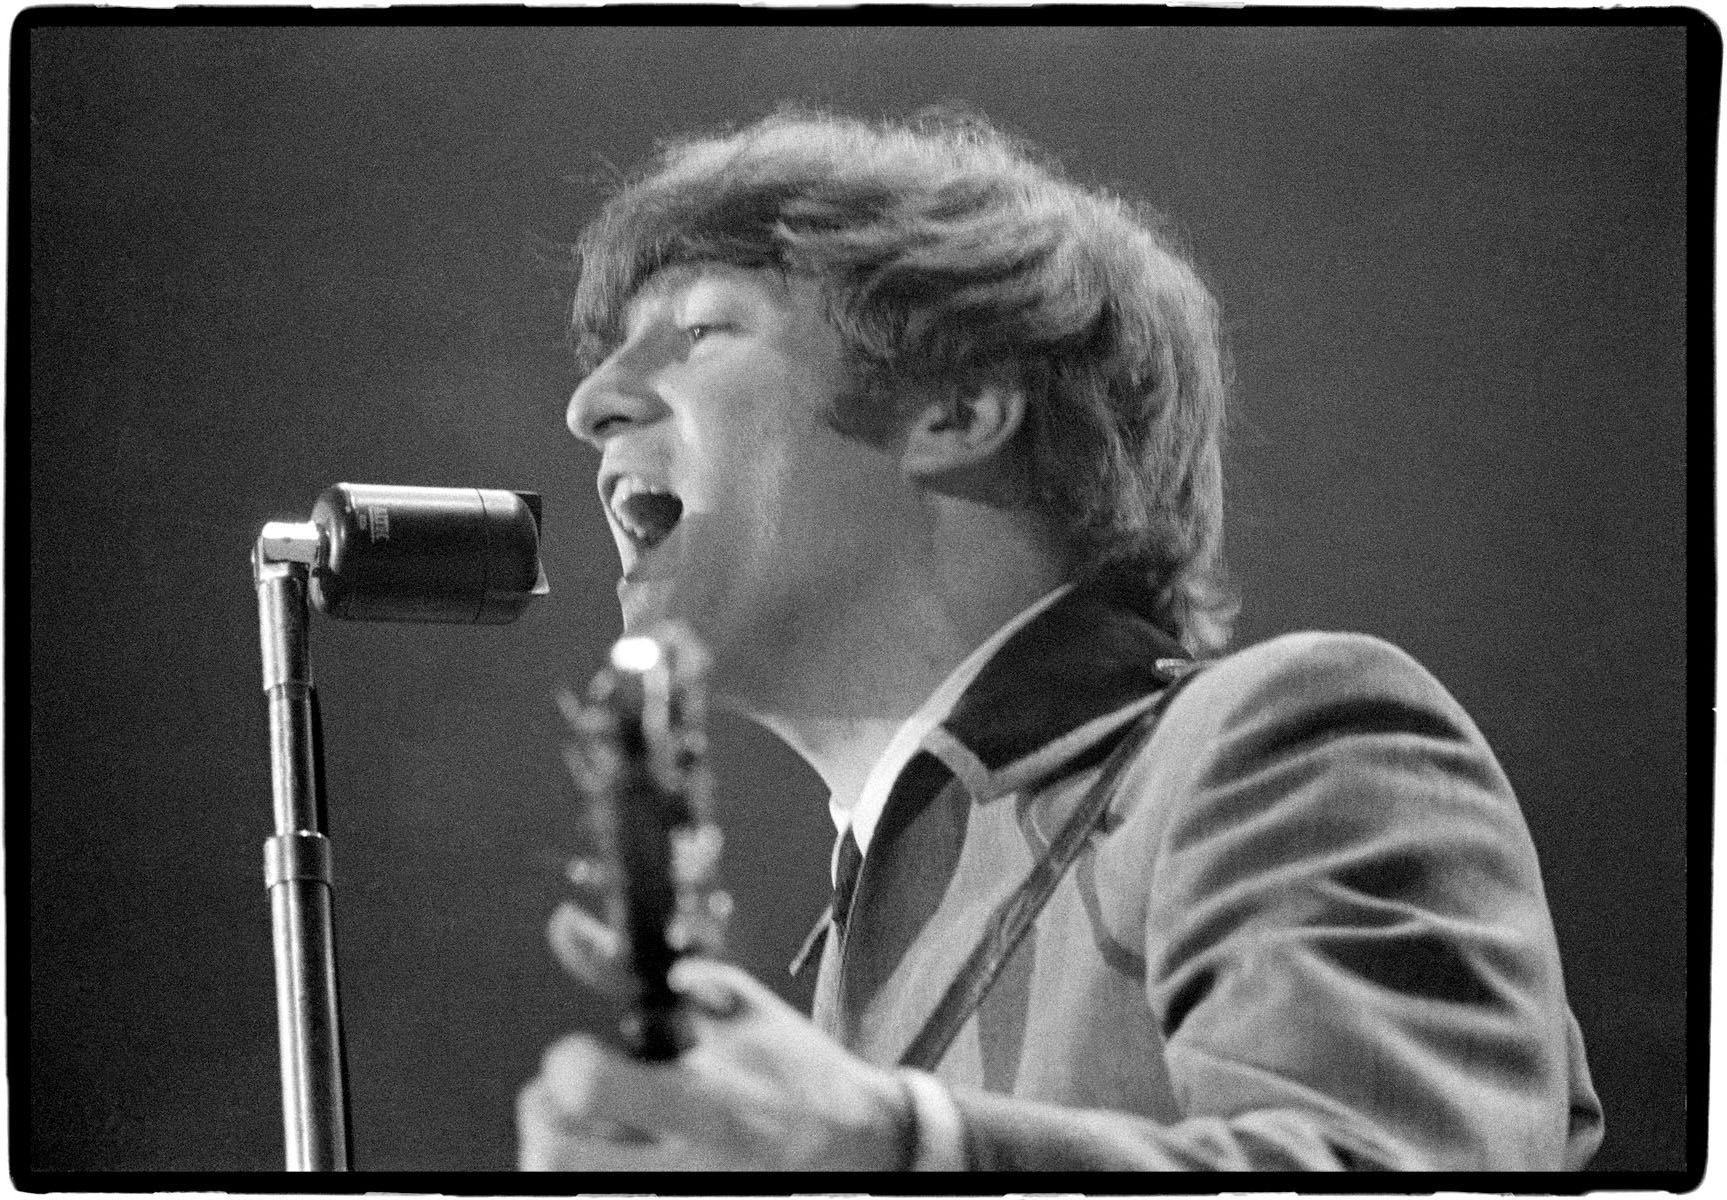 「john lennon beatles concert」の画像検索結果